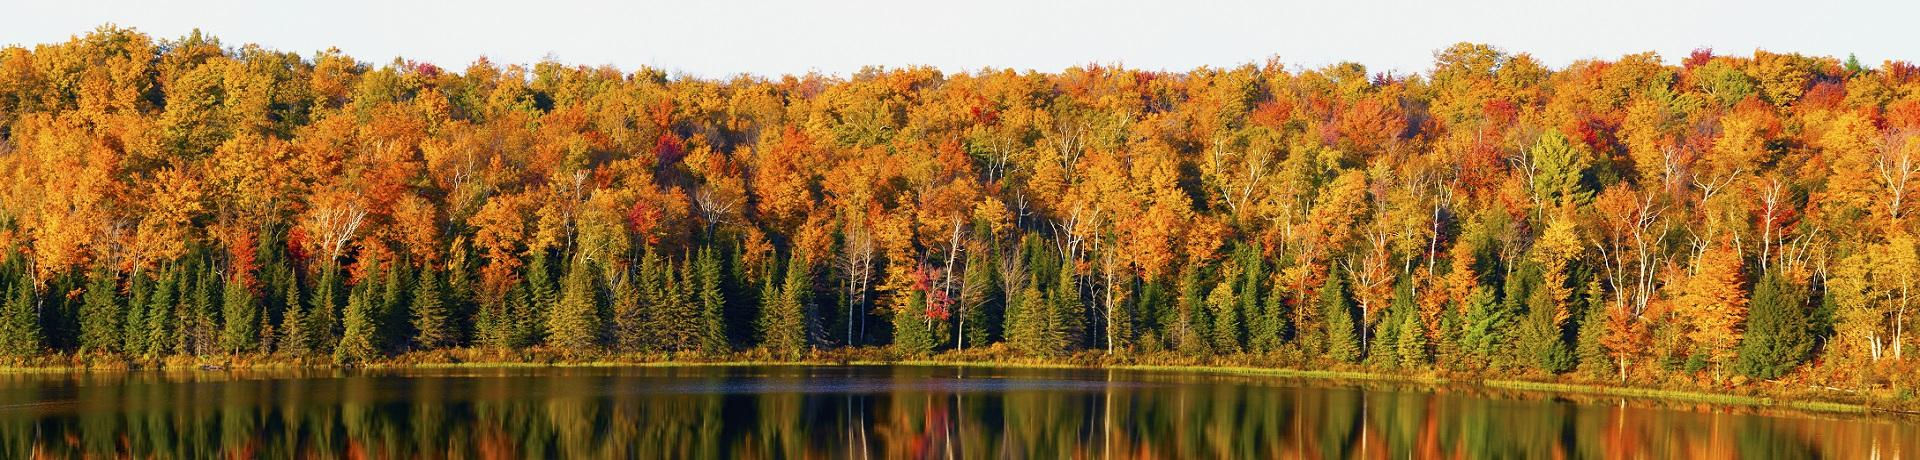 Kanada: Quebec - Emotion